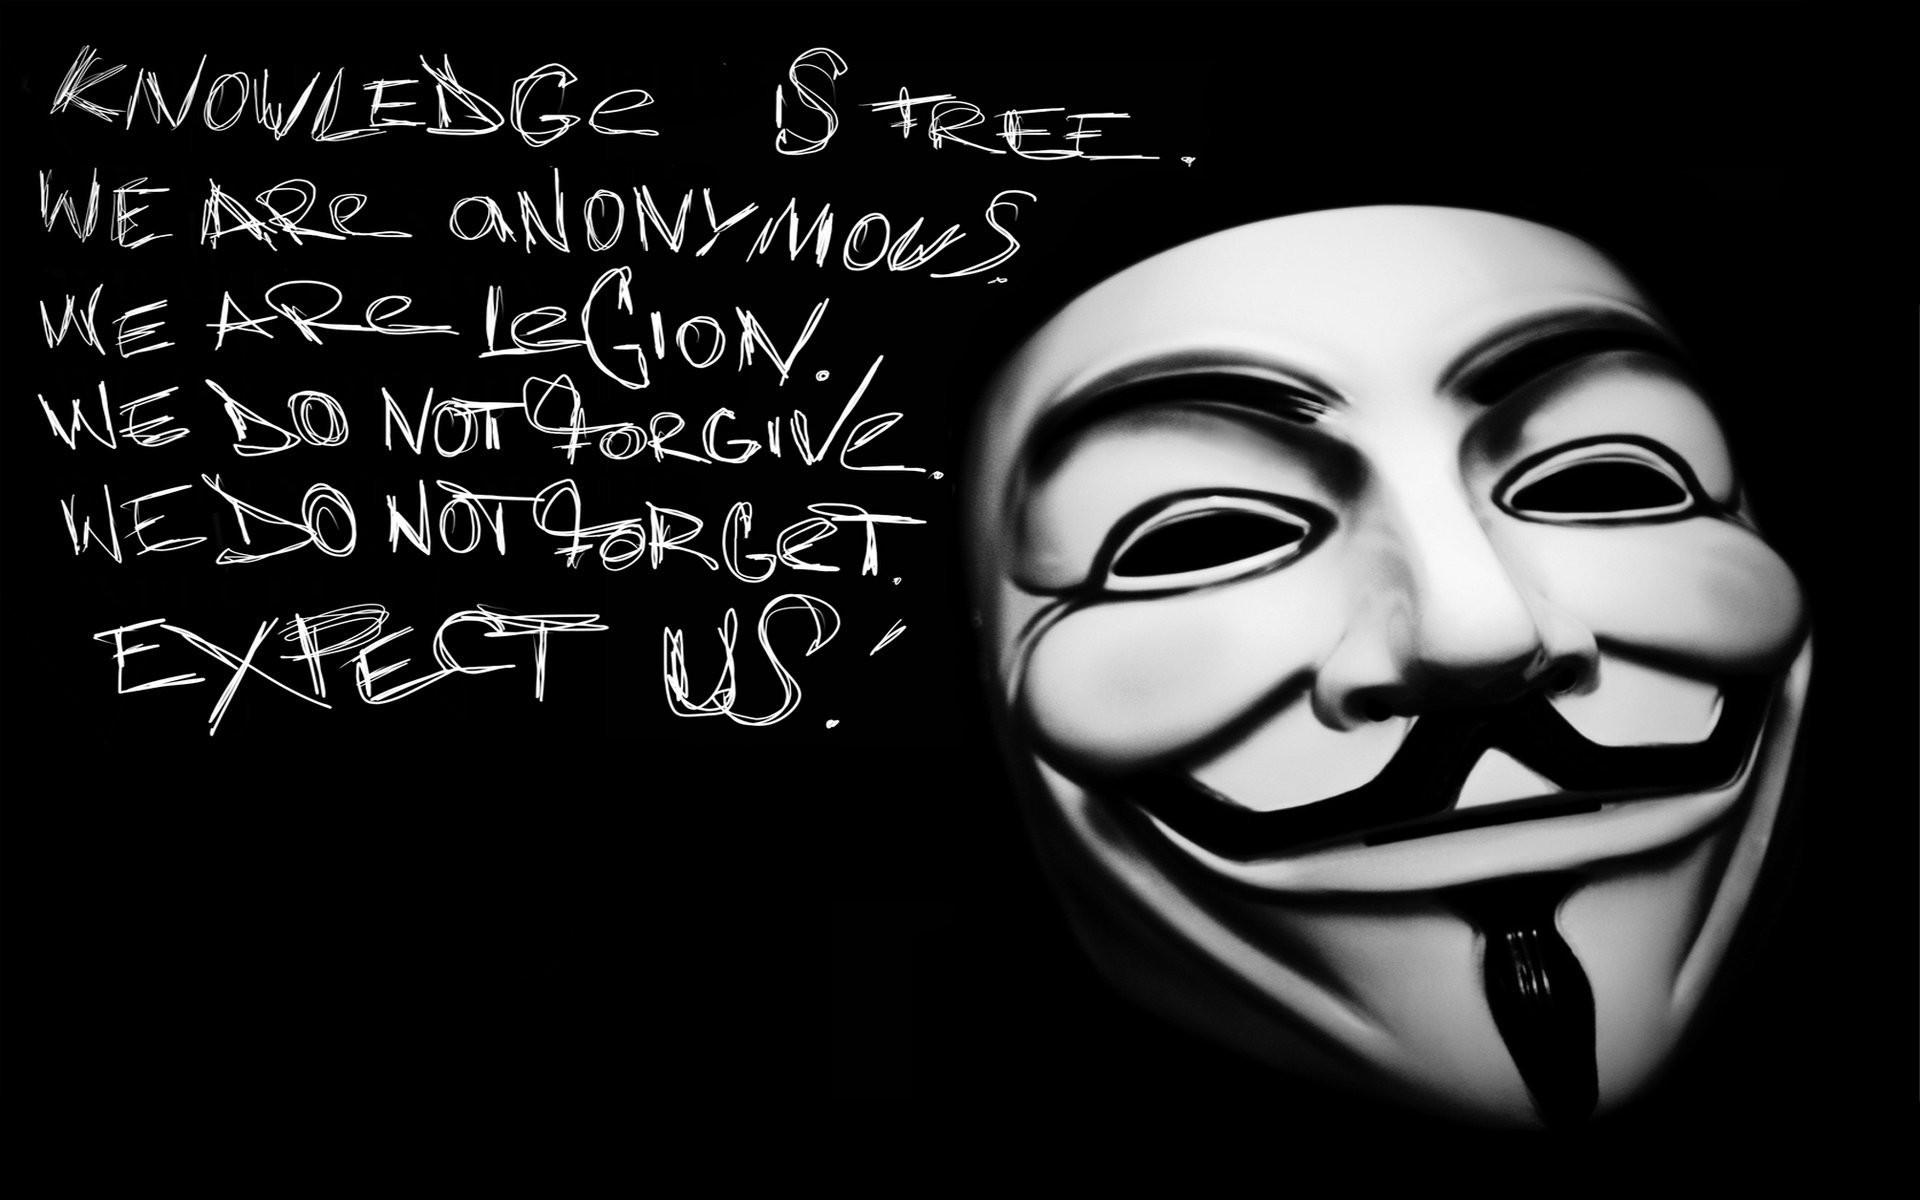 anonymous-wallpaper-hd.jpg